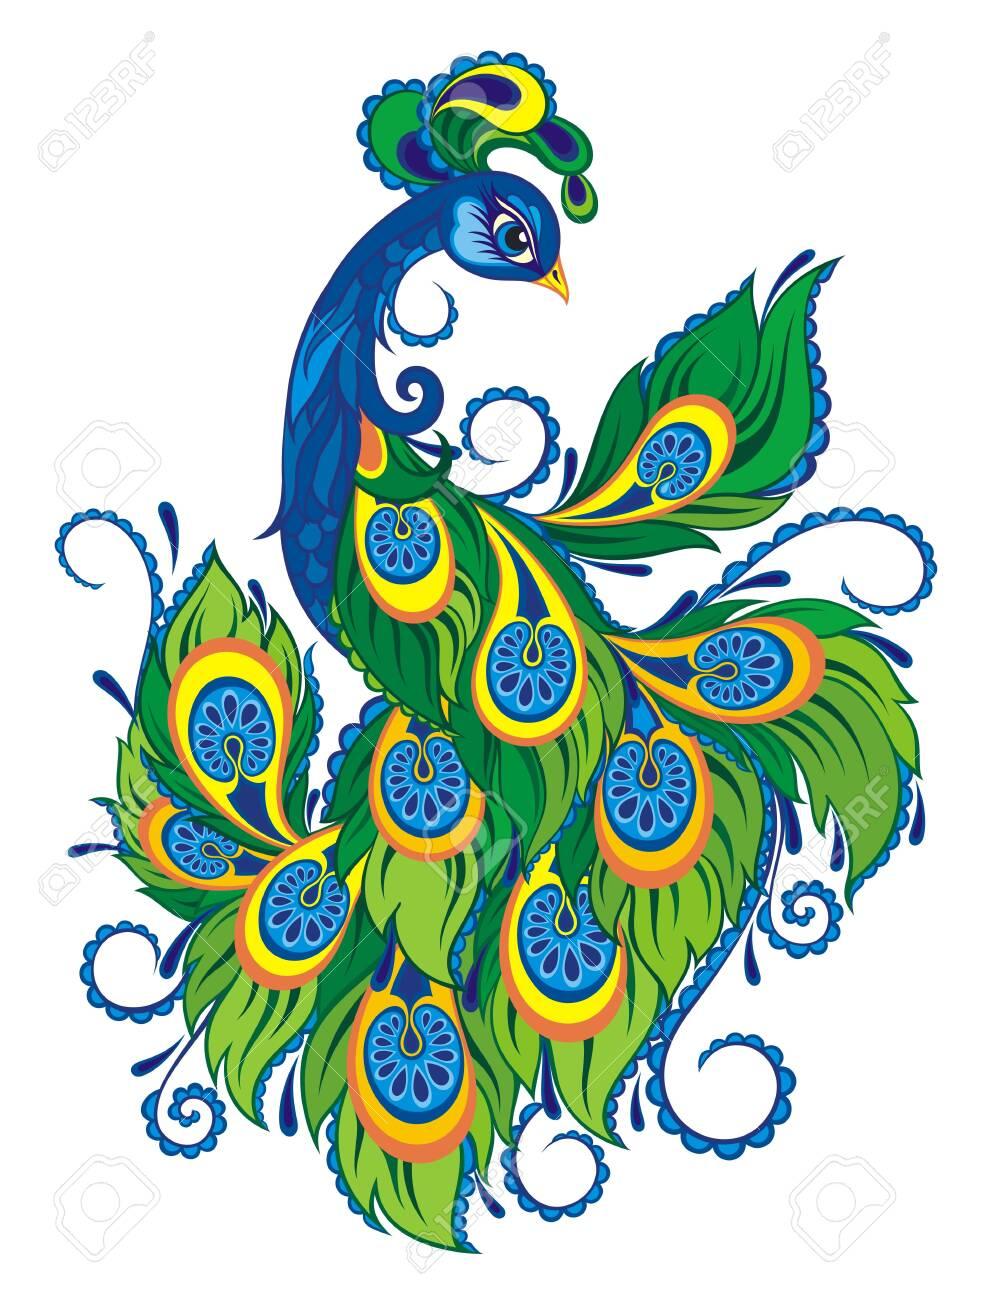 peacock bird beautiful peacock cartoon royalty free cliparts vectors and stock illustration image 147440737 123rf com